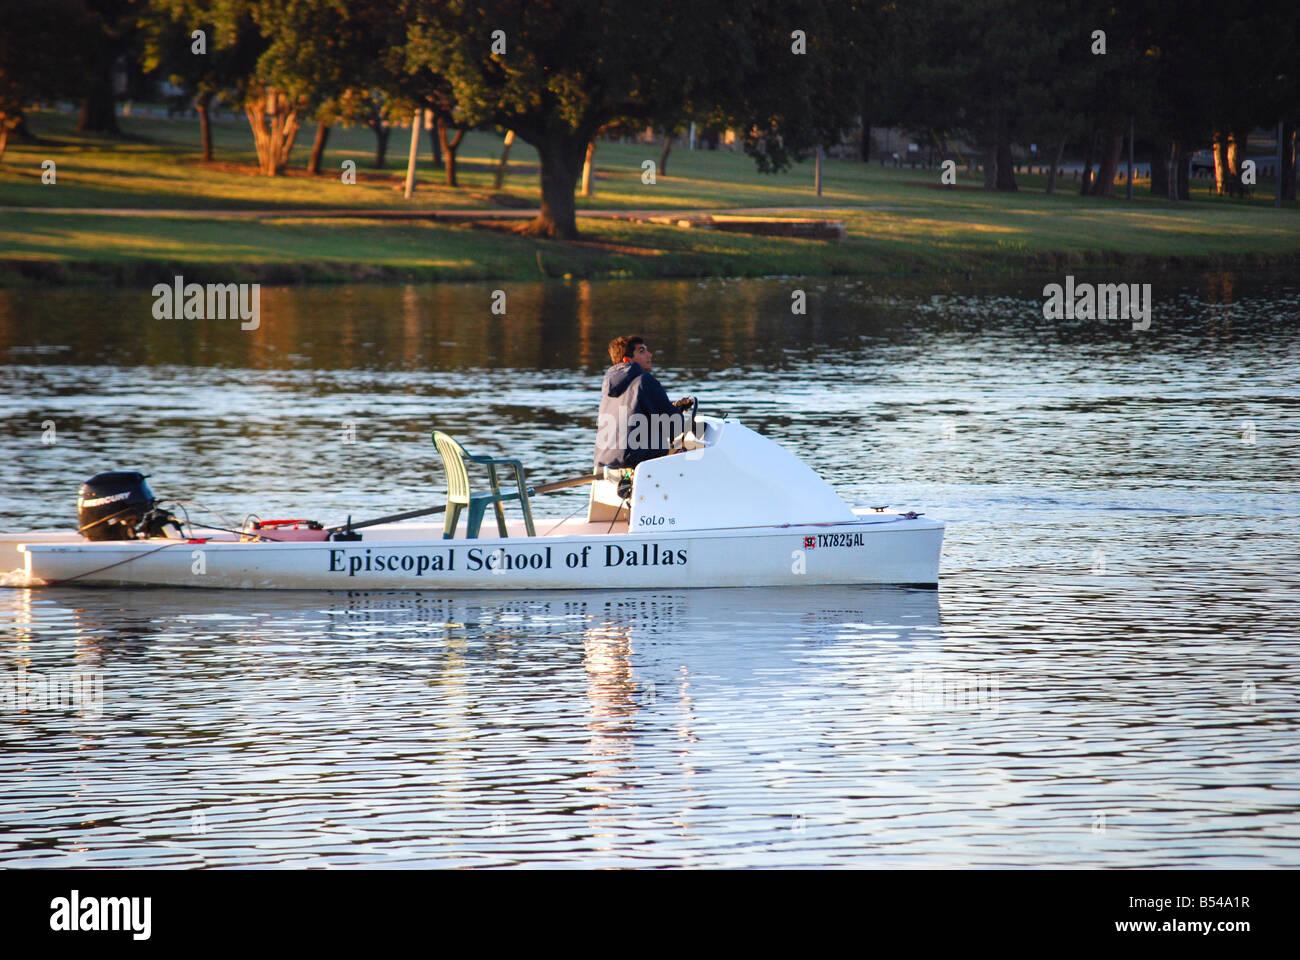 Dallas Episcopal School Boat - Stock Image